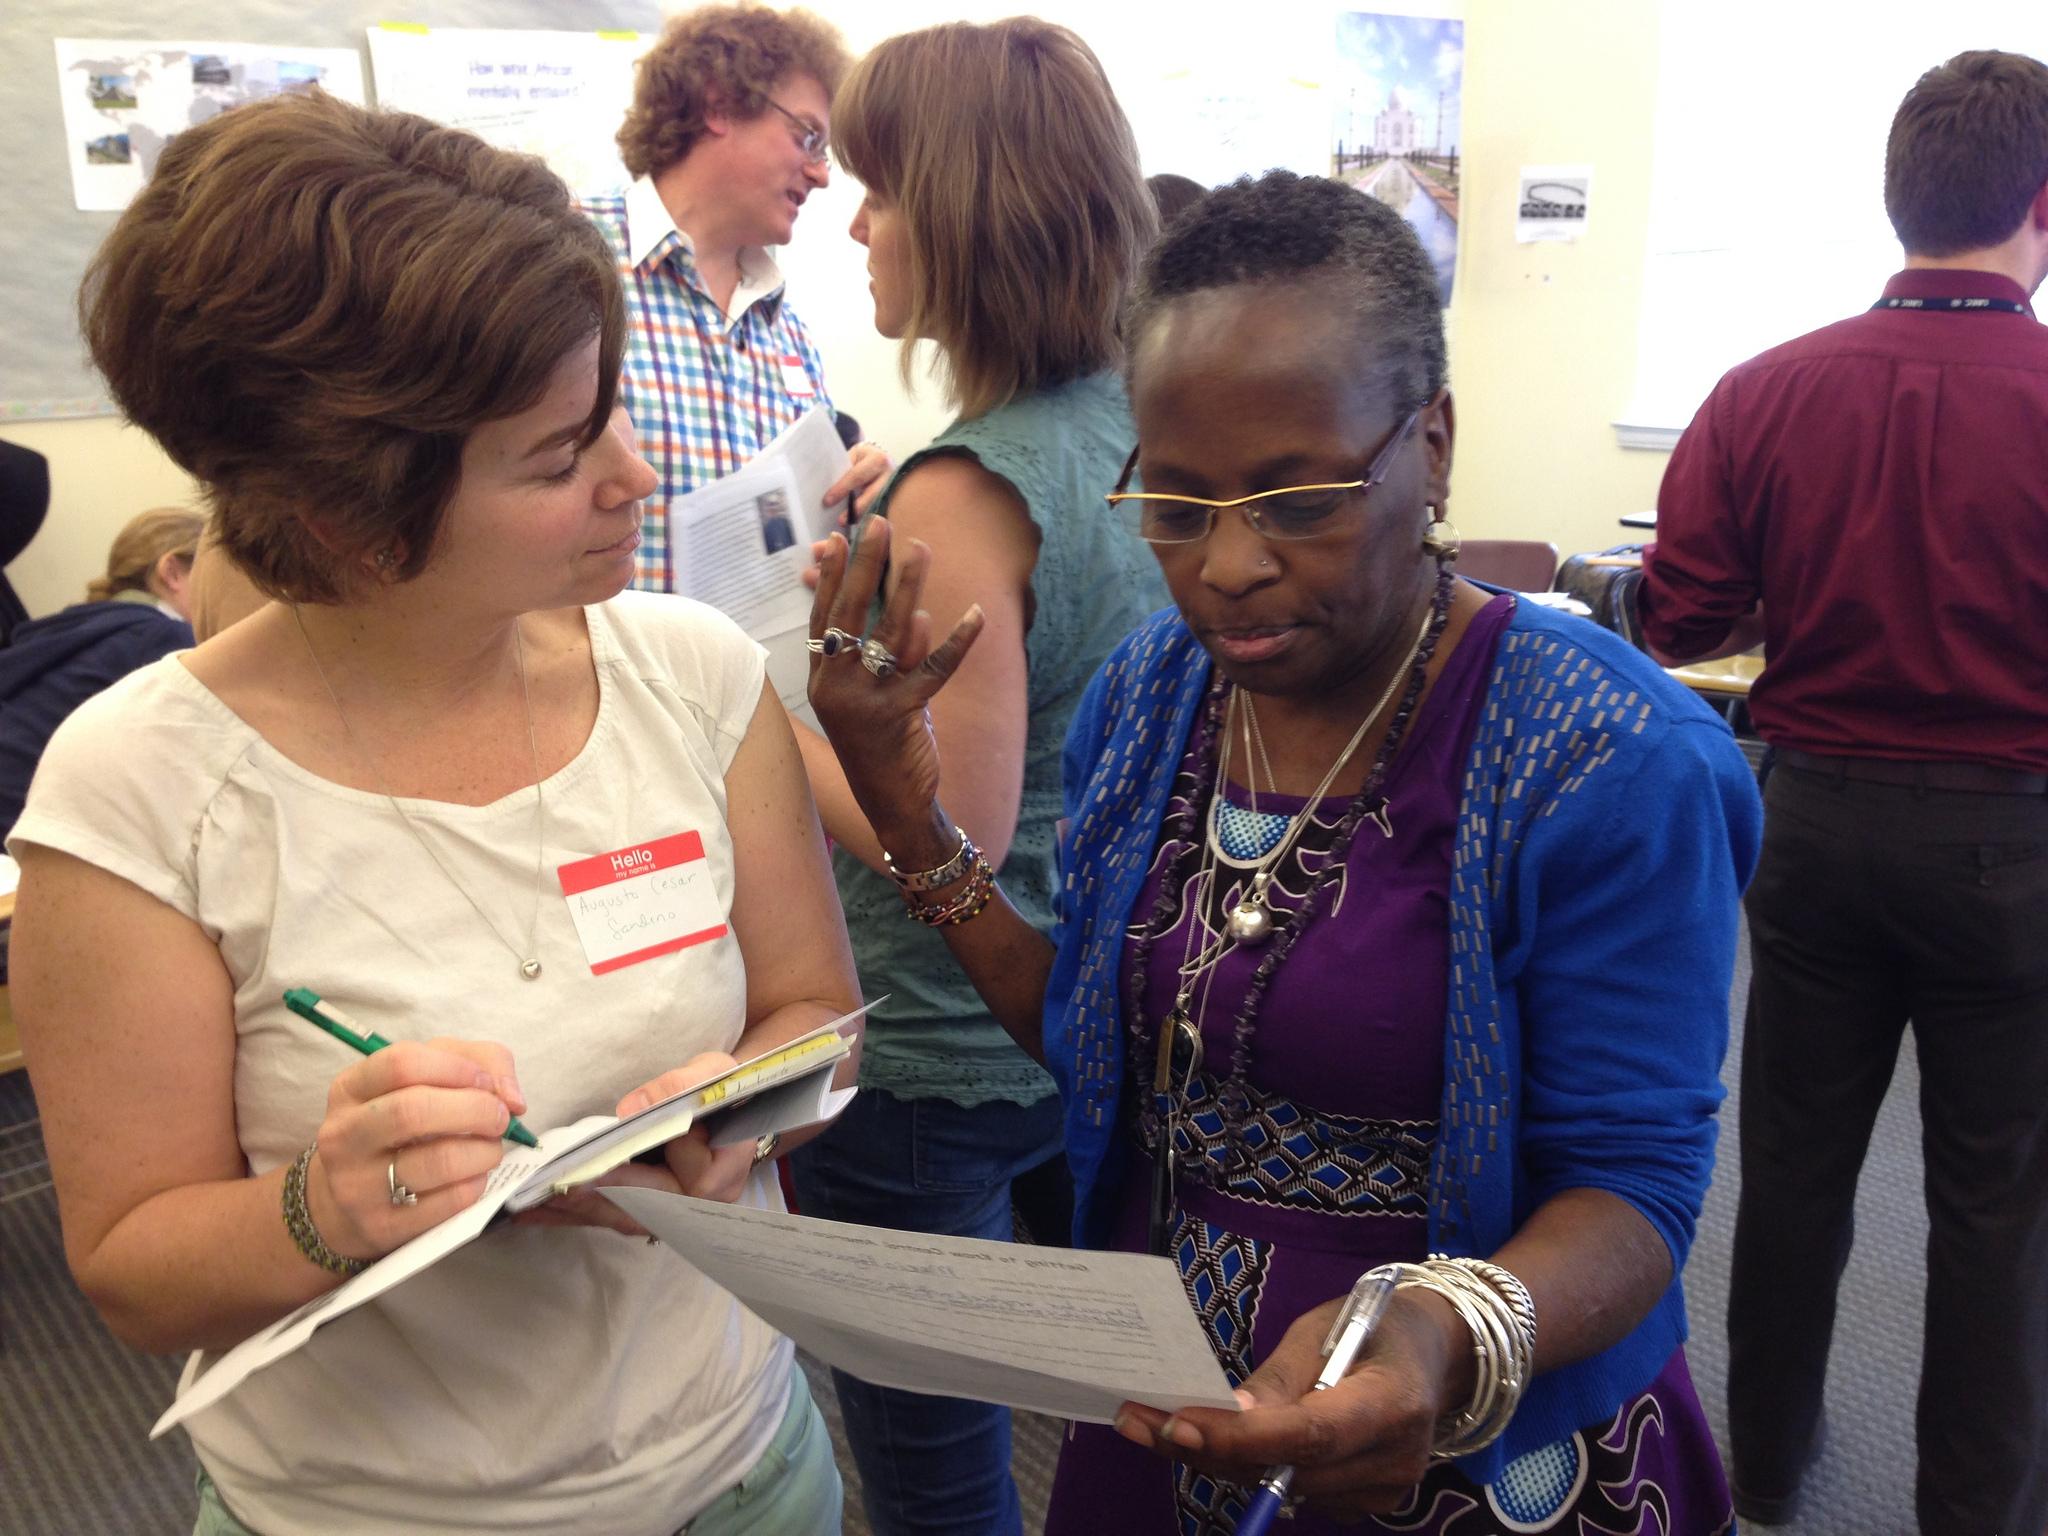 D.C. public school teachers engaged in the lesson.